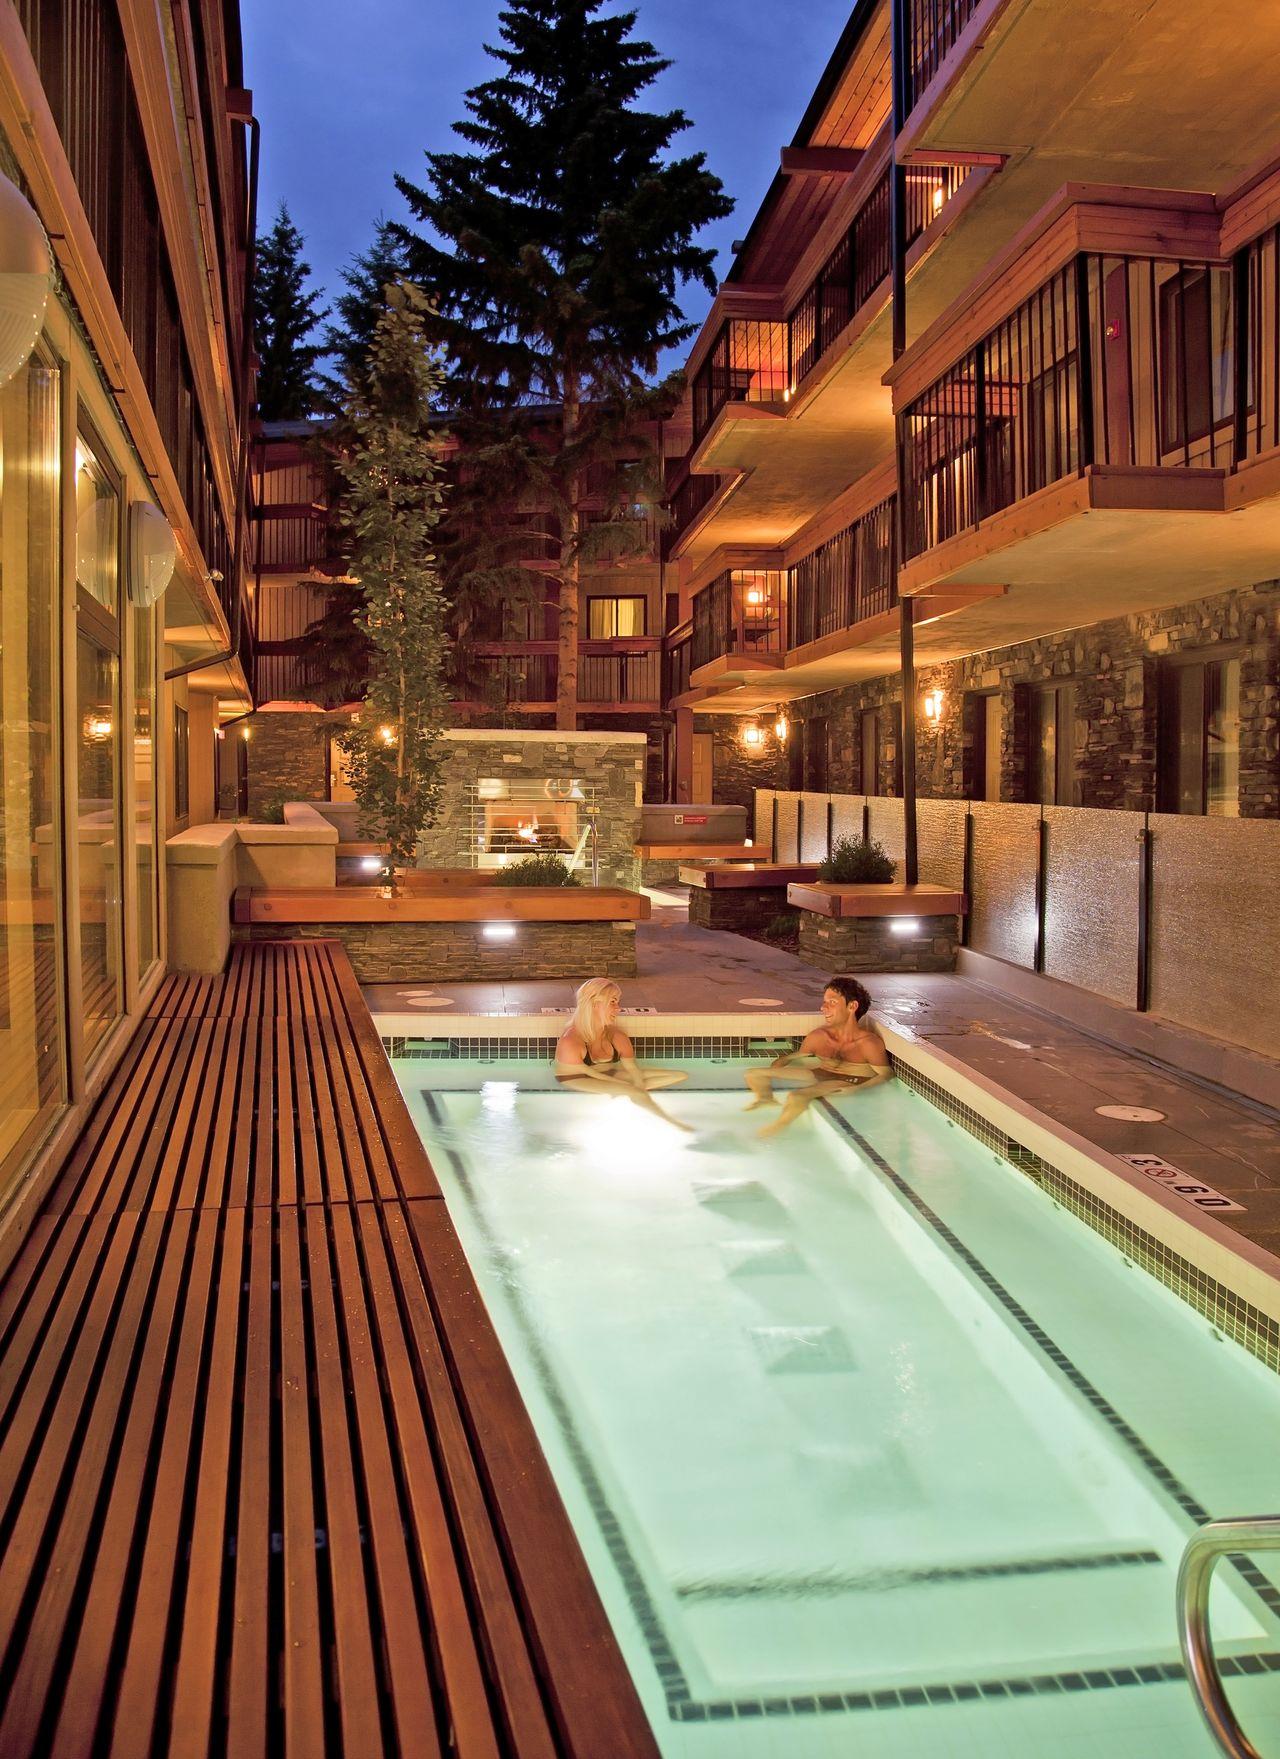 Hotel alberta banff aspen lodge canusa for Stylische hotels